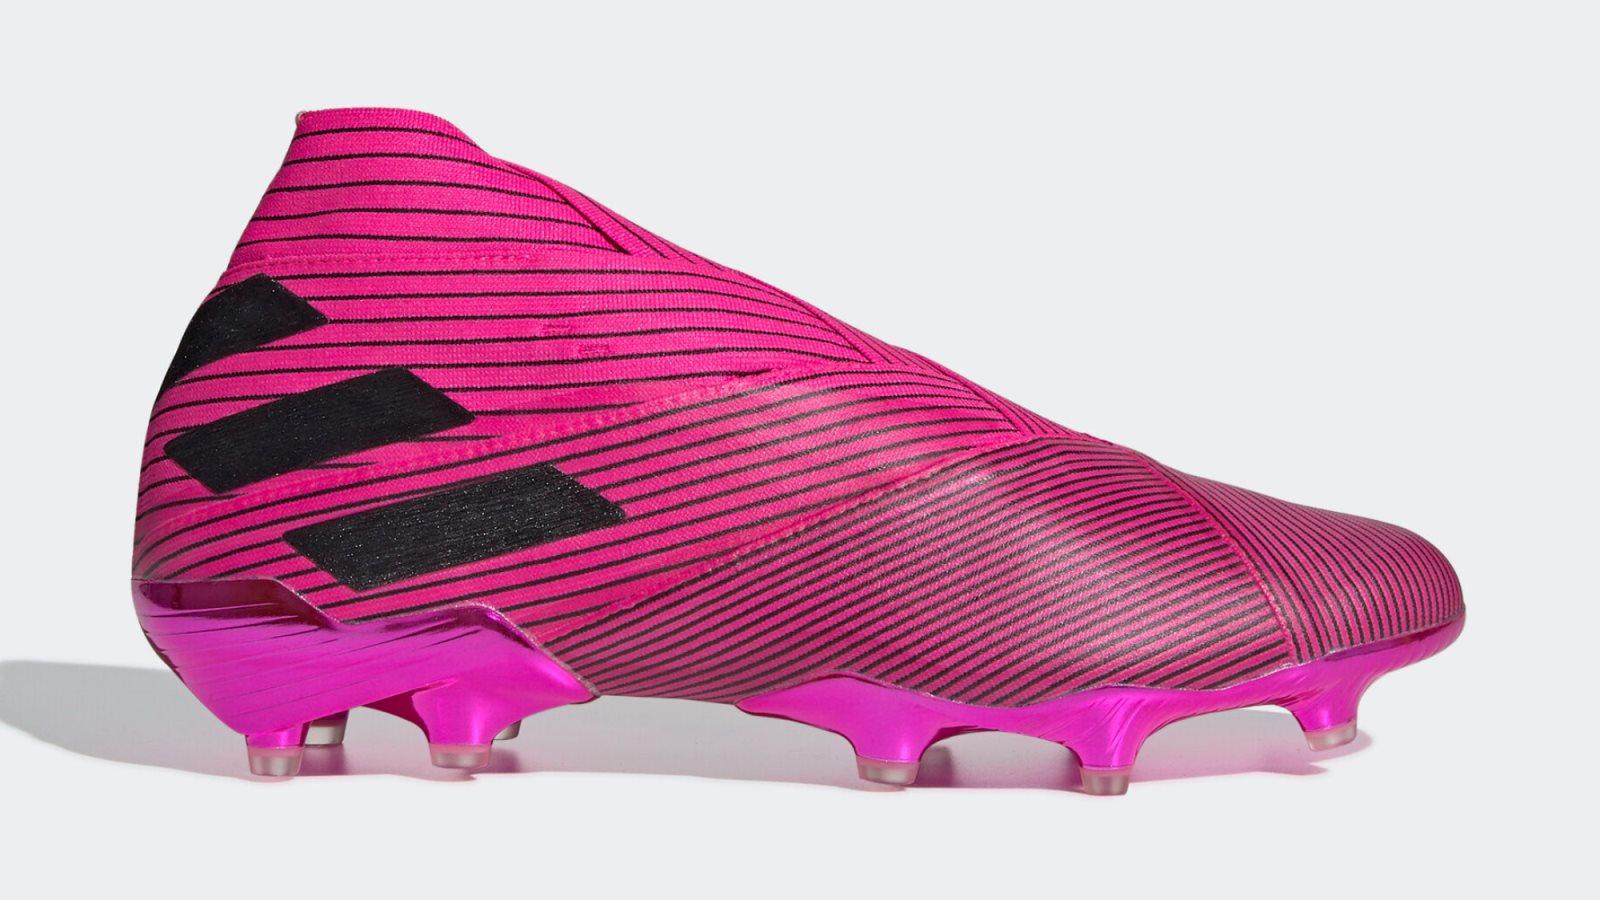 c14be456c91 Moise Keane Football Boots